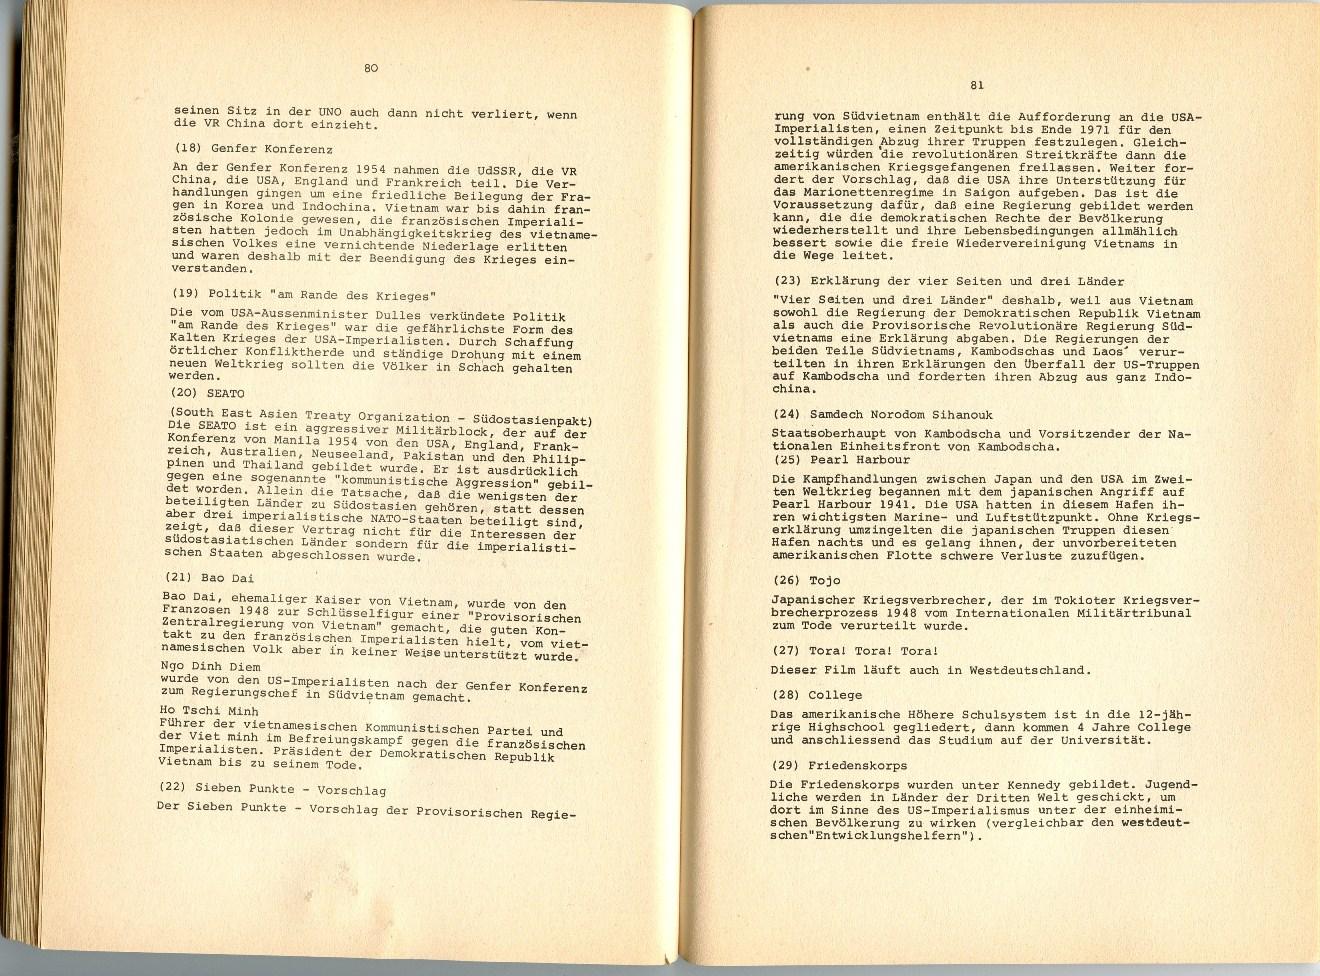 ZB_VRChina_Bollwerk_1971_42